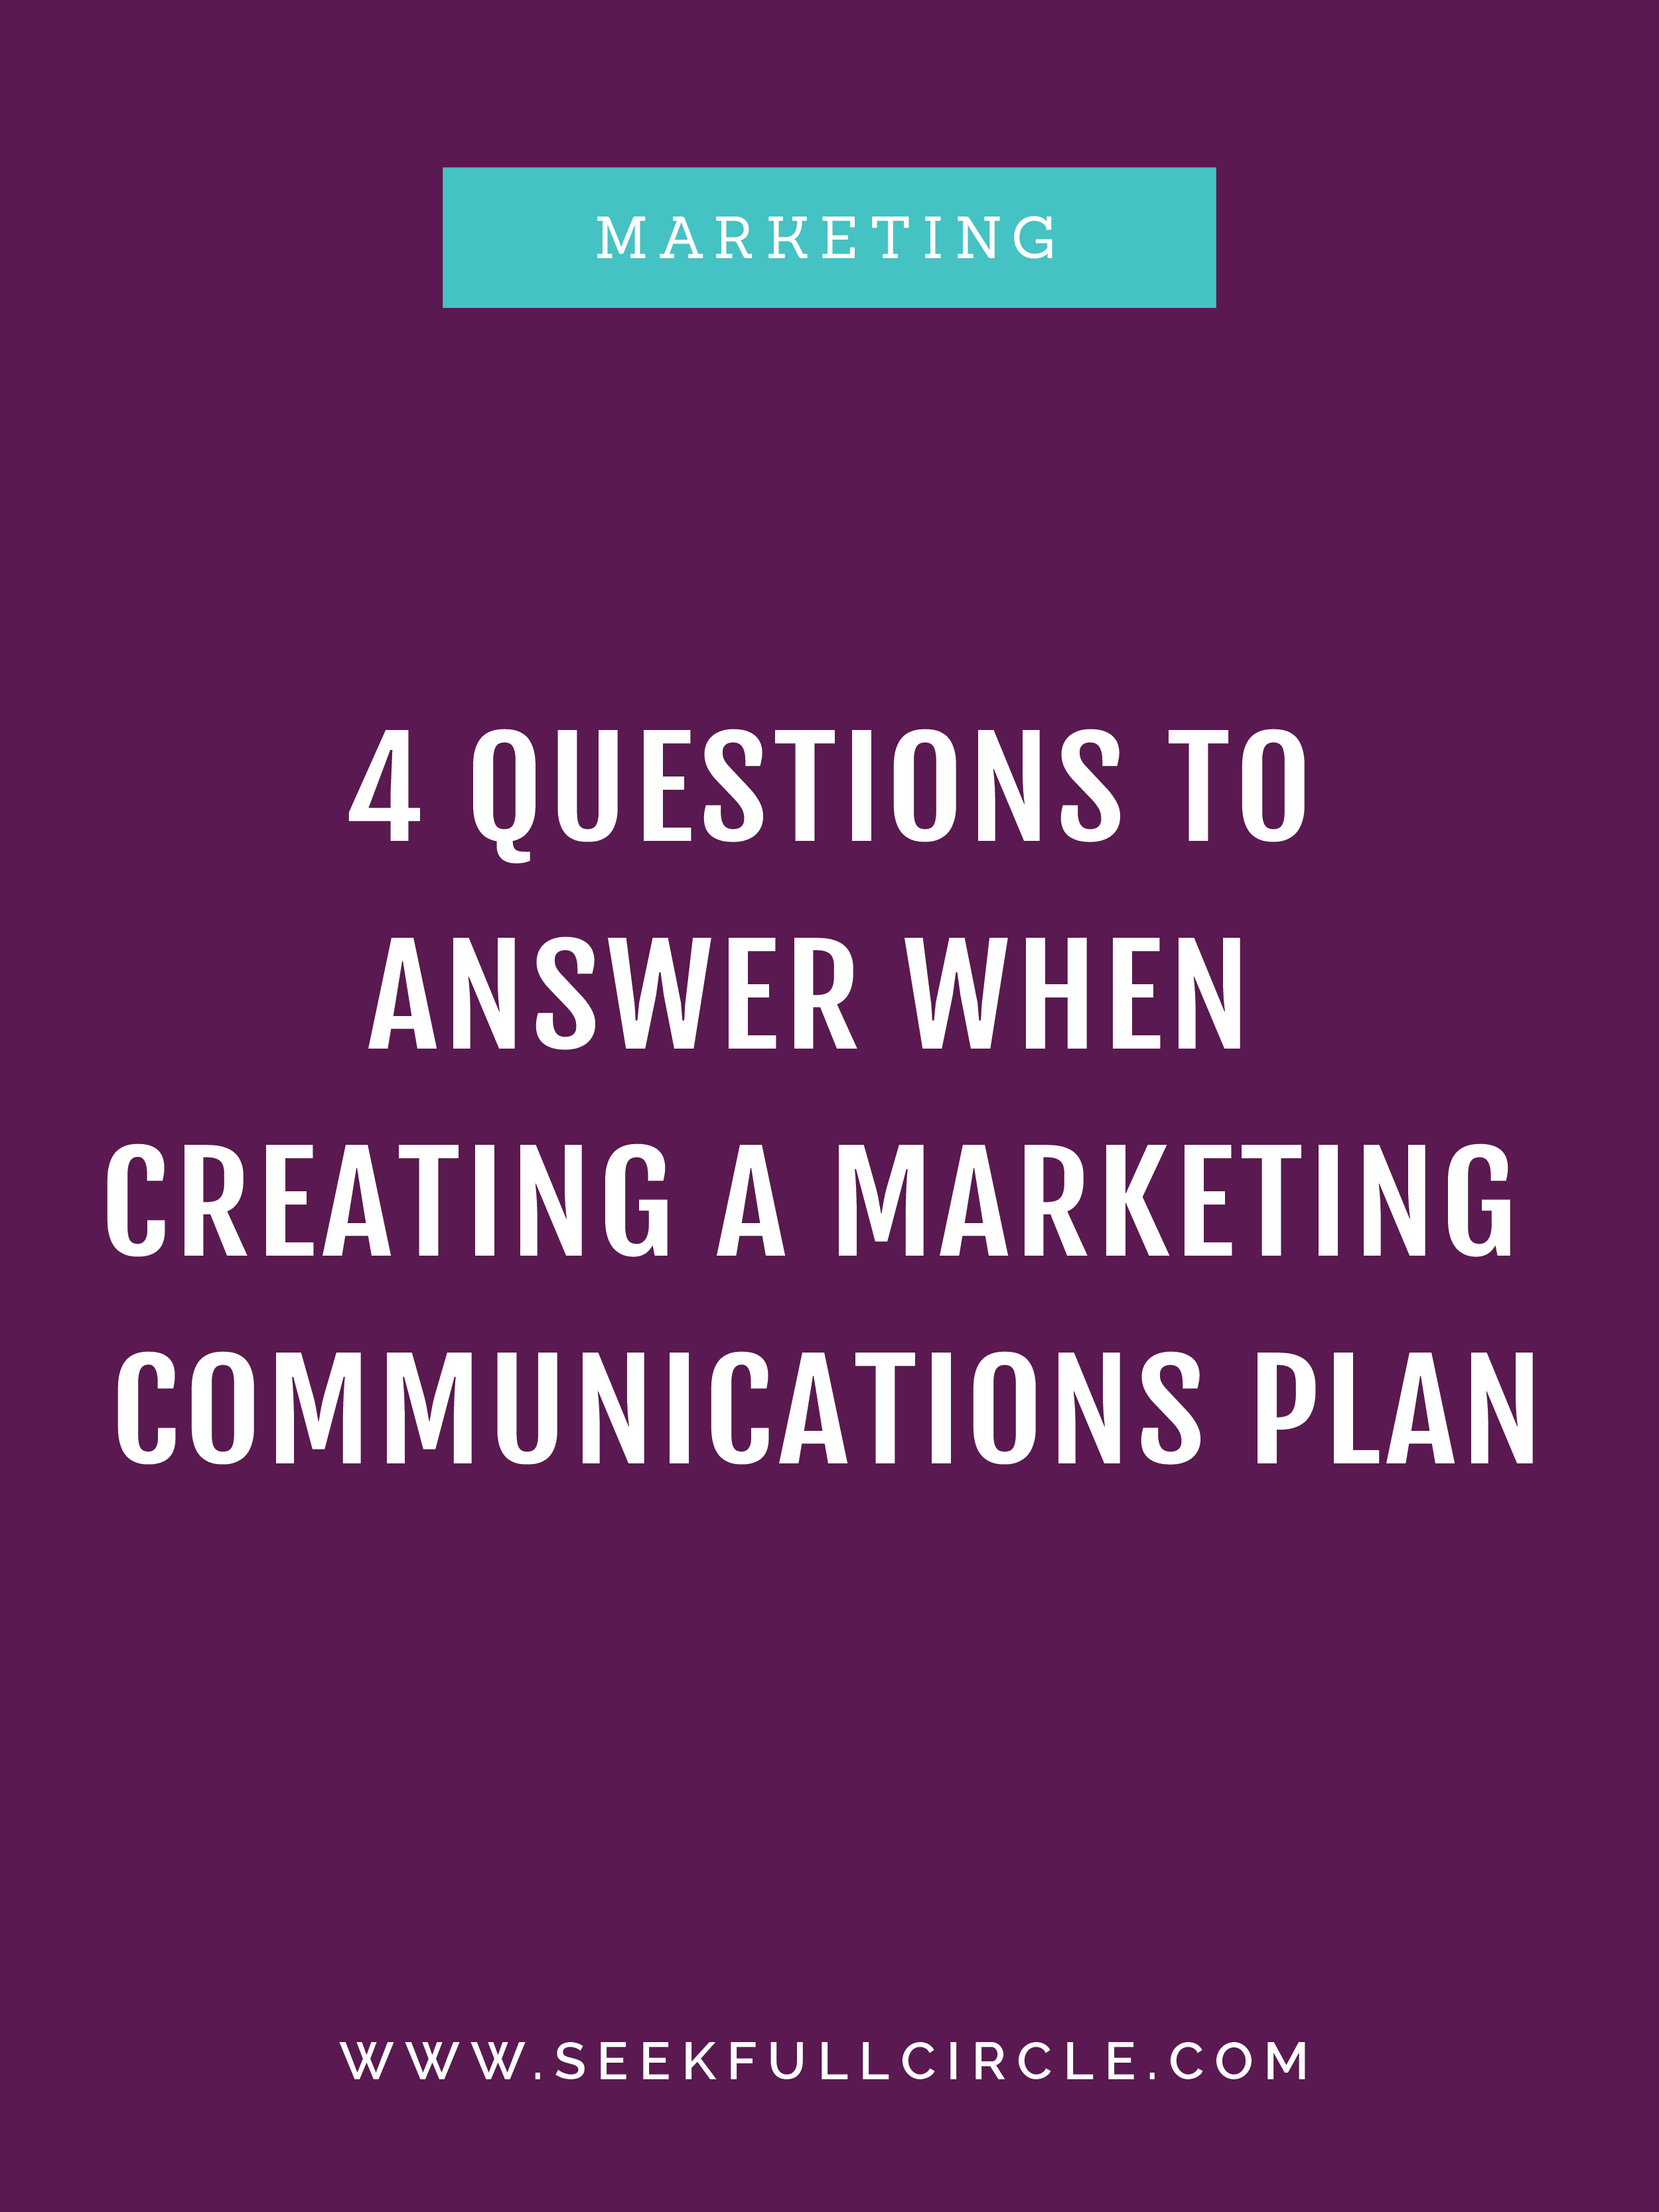 kim waltman fullcircle creative + coaching creating a marketing communications plan blog post